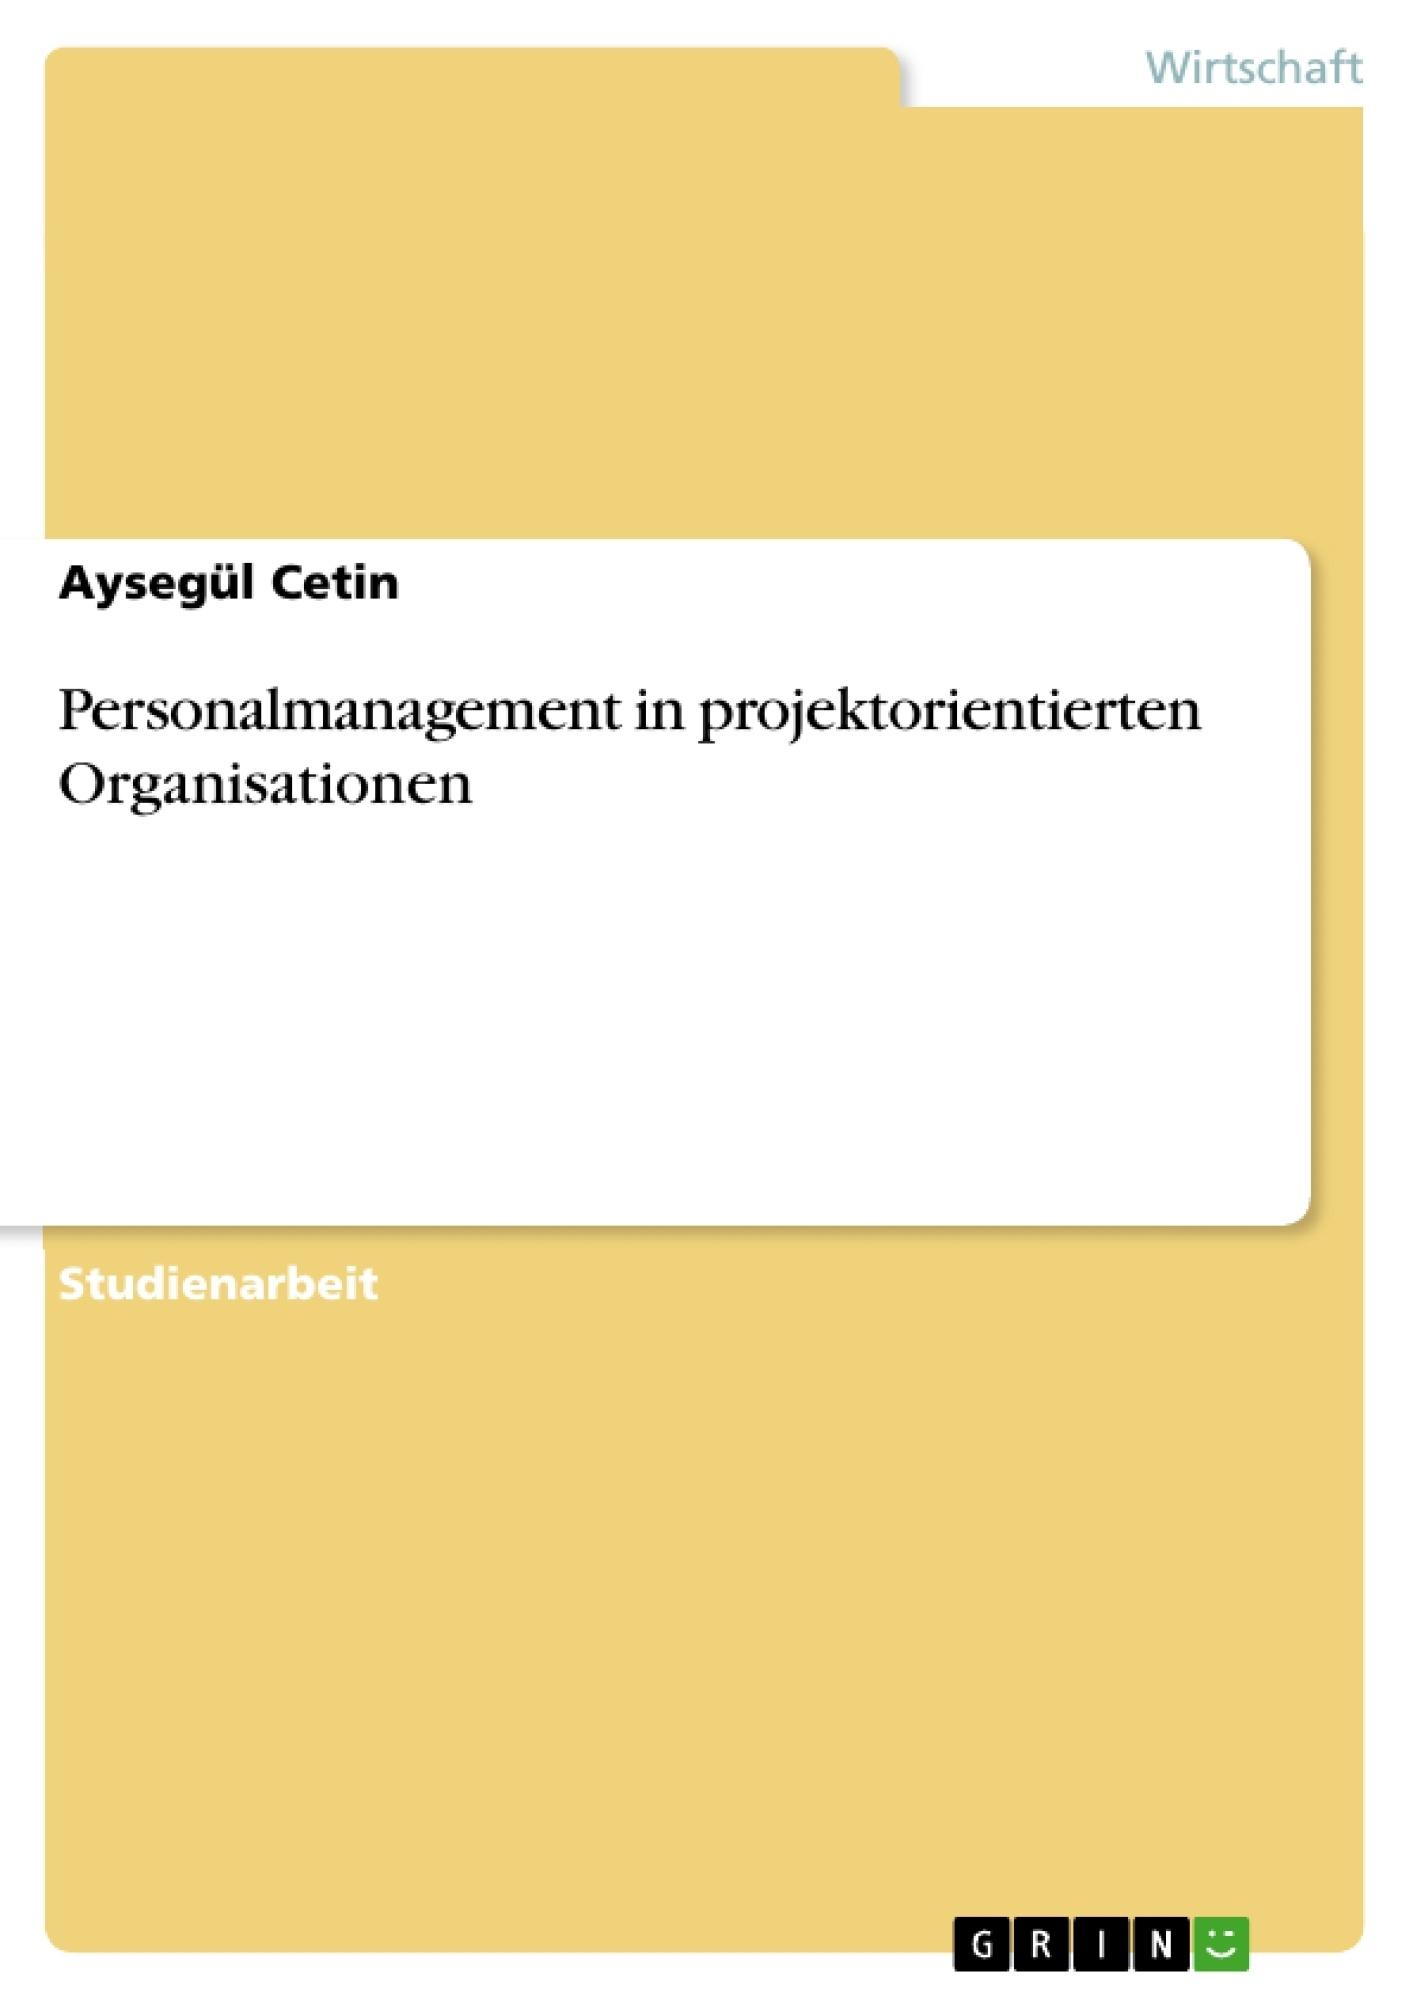 Titel: Personalmanagement in projektorientierten Organisationen